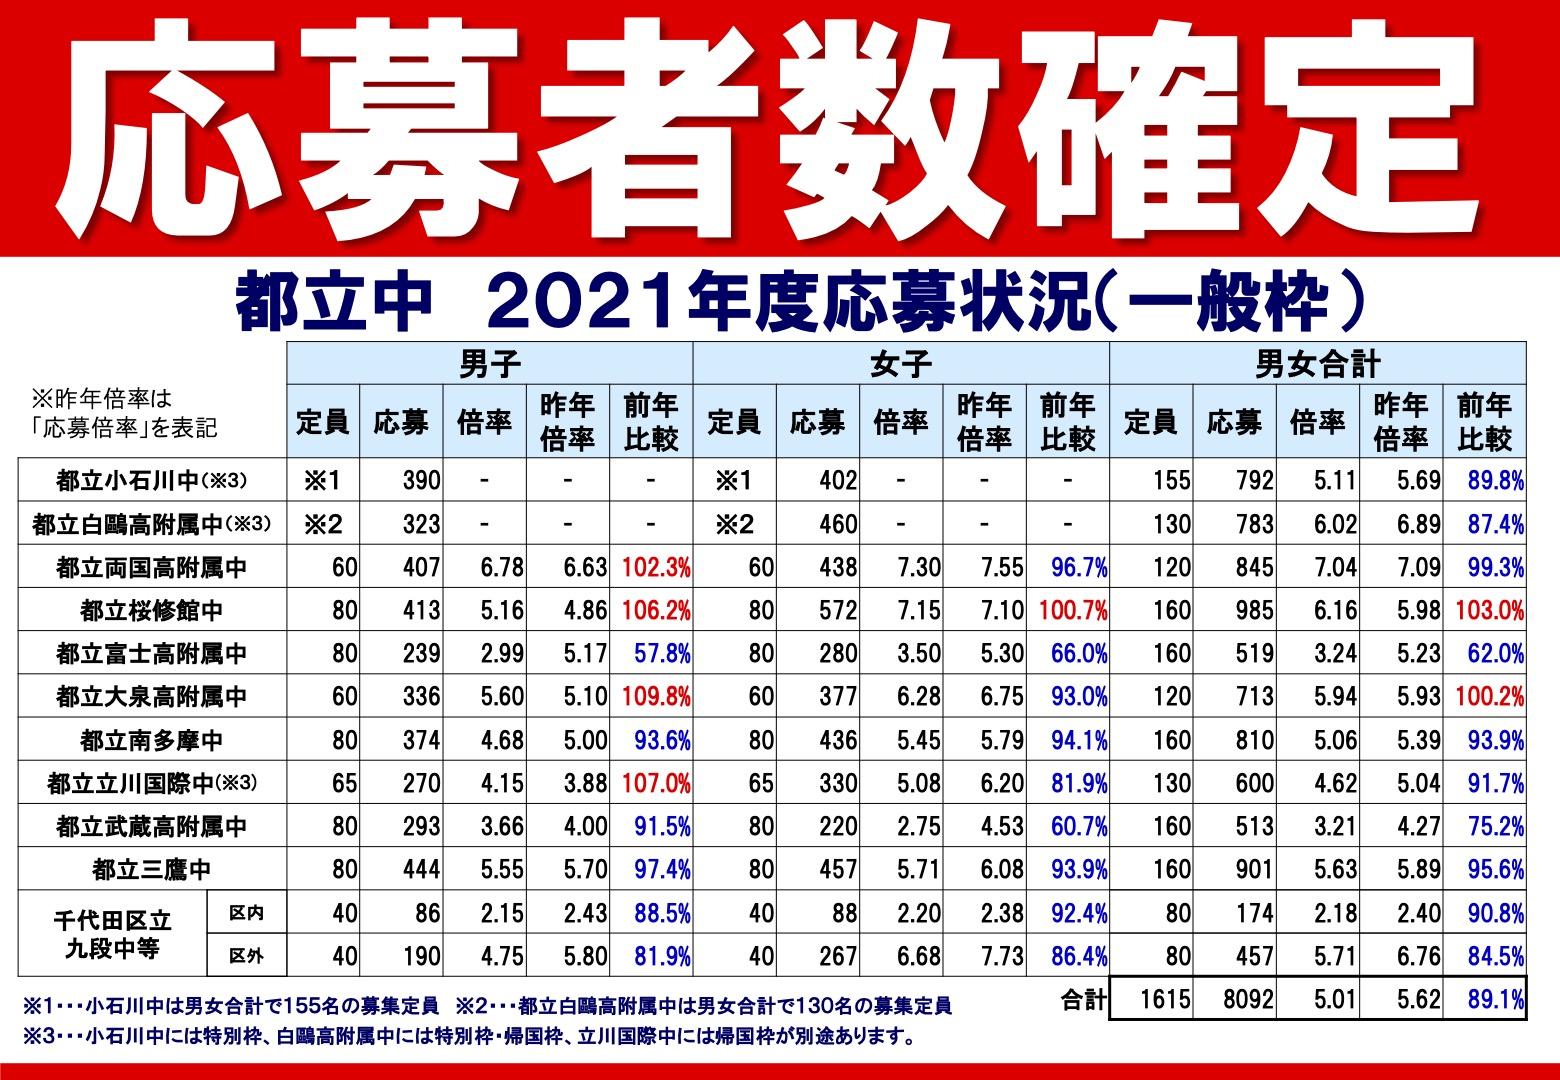 2021_%e5%bf%9c%e5%8b%9f%e8%80%85%e7%8a%b6%e6%b3%81_11%e6%a0%a1